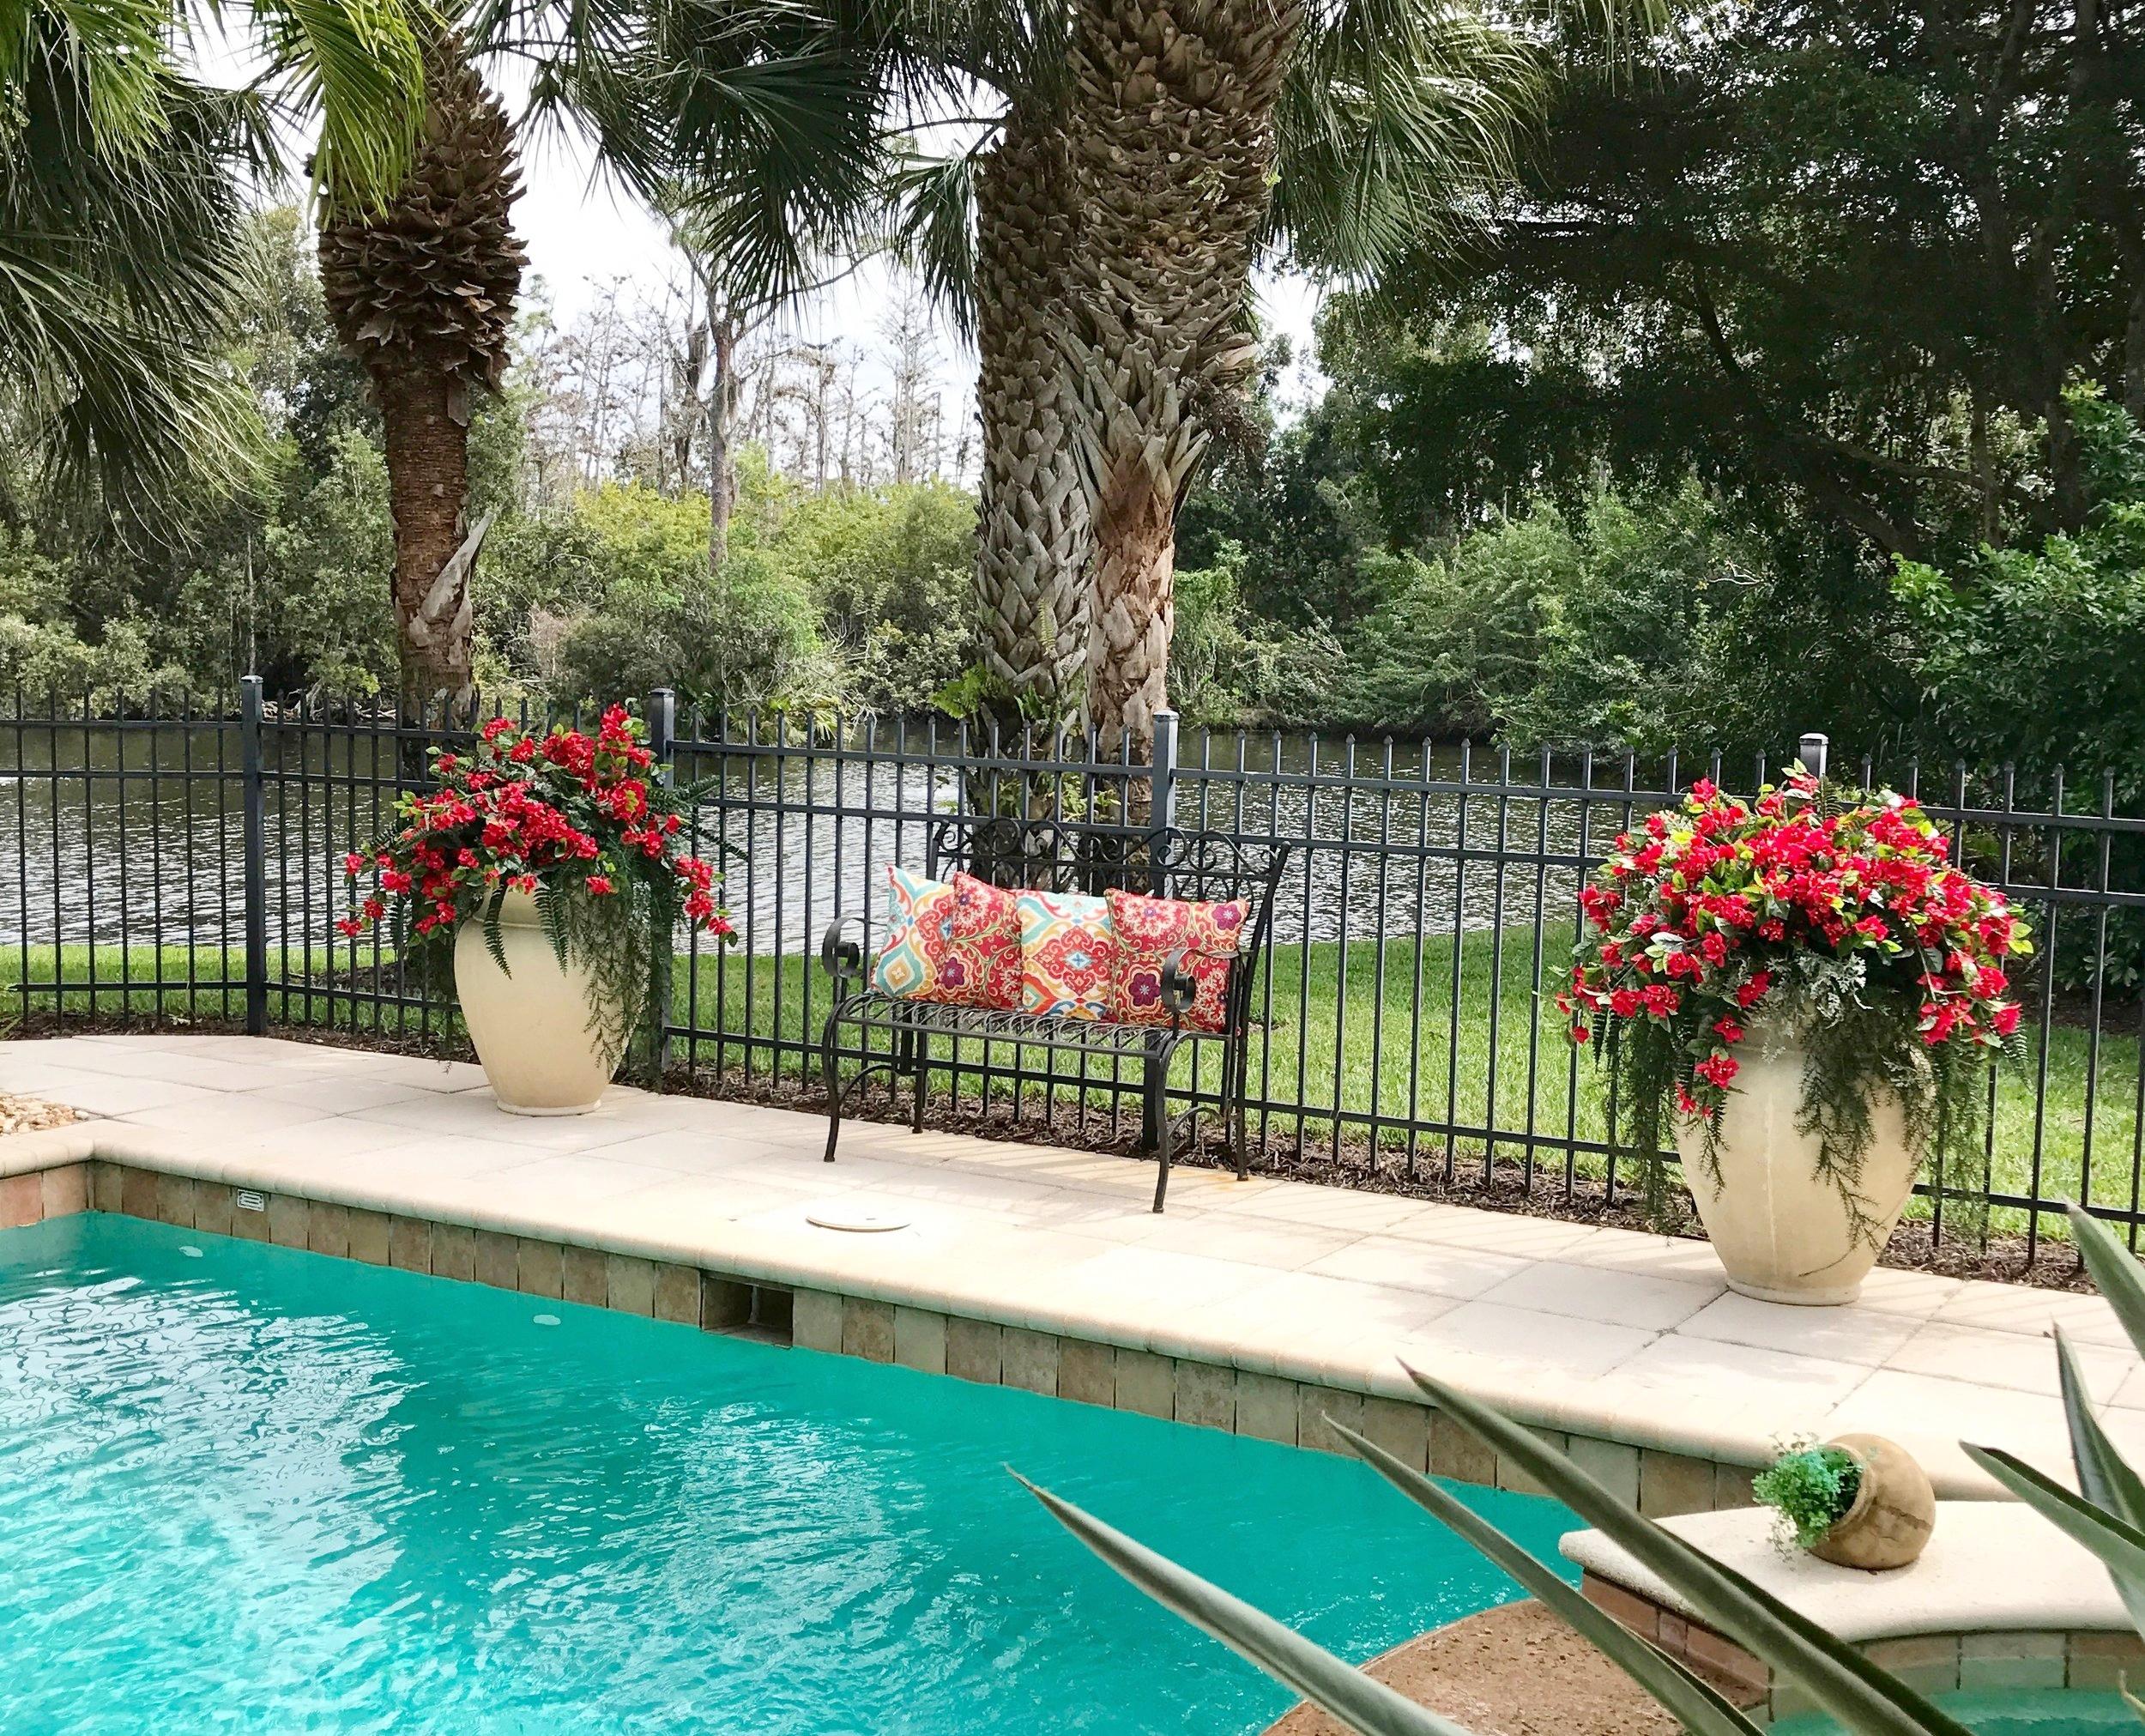 FLORIDA POOL LANAI CONTAINER PLANTINGS